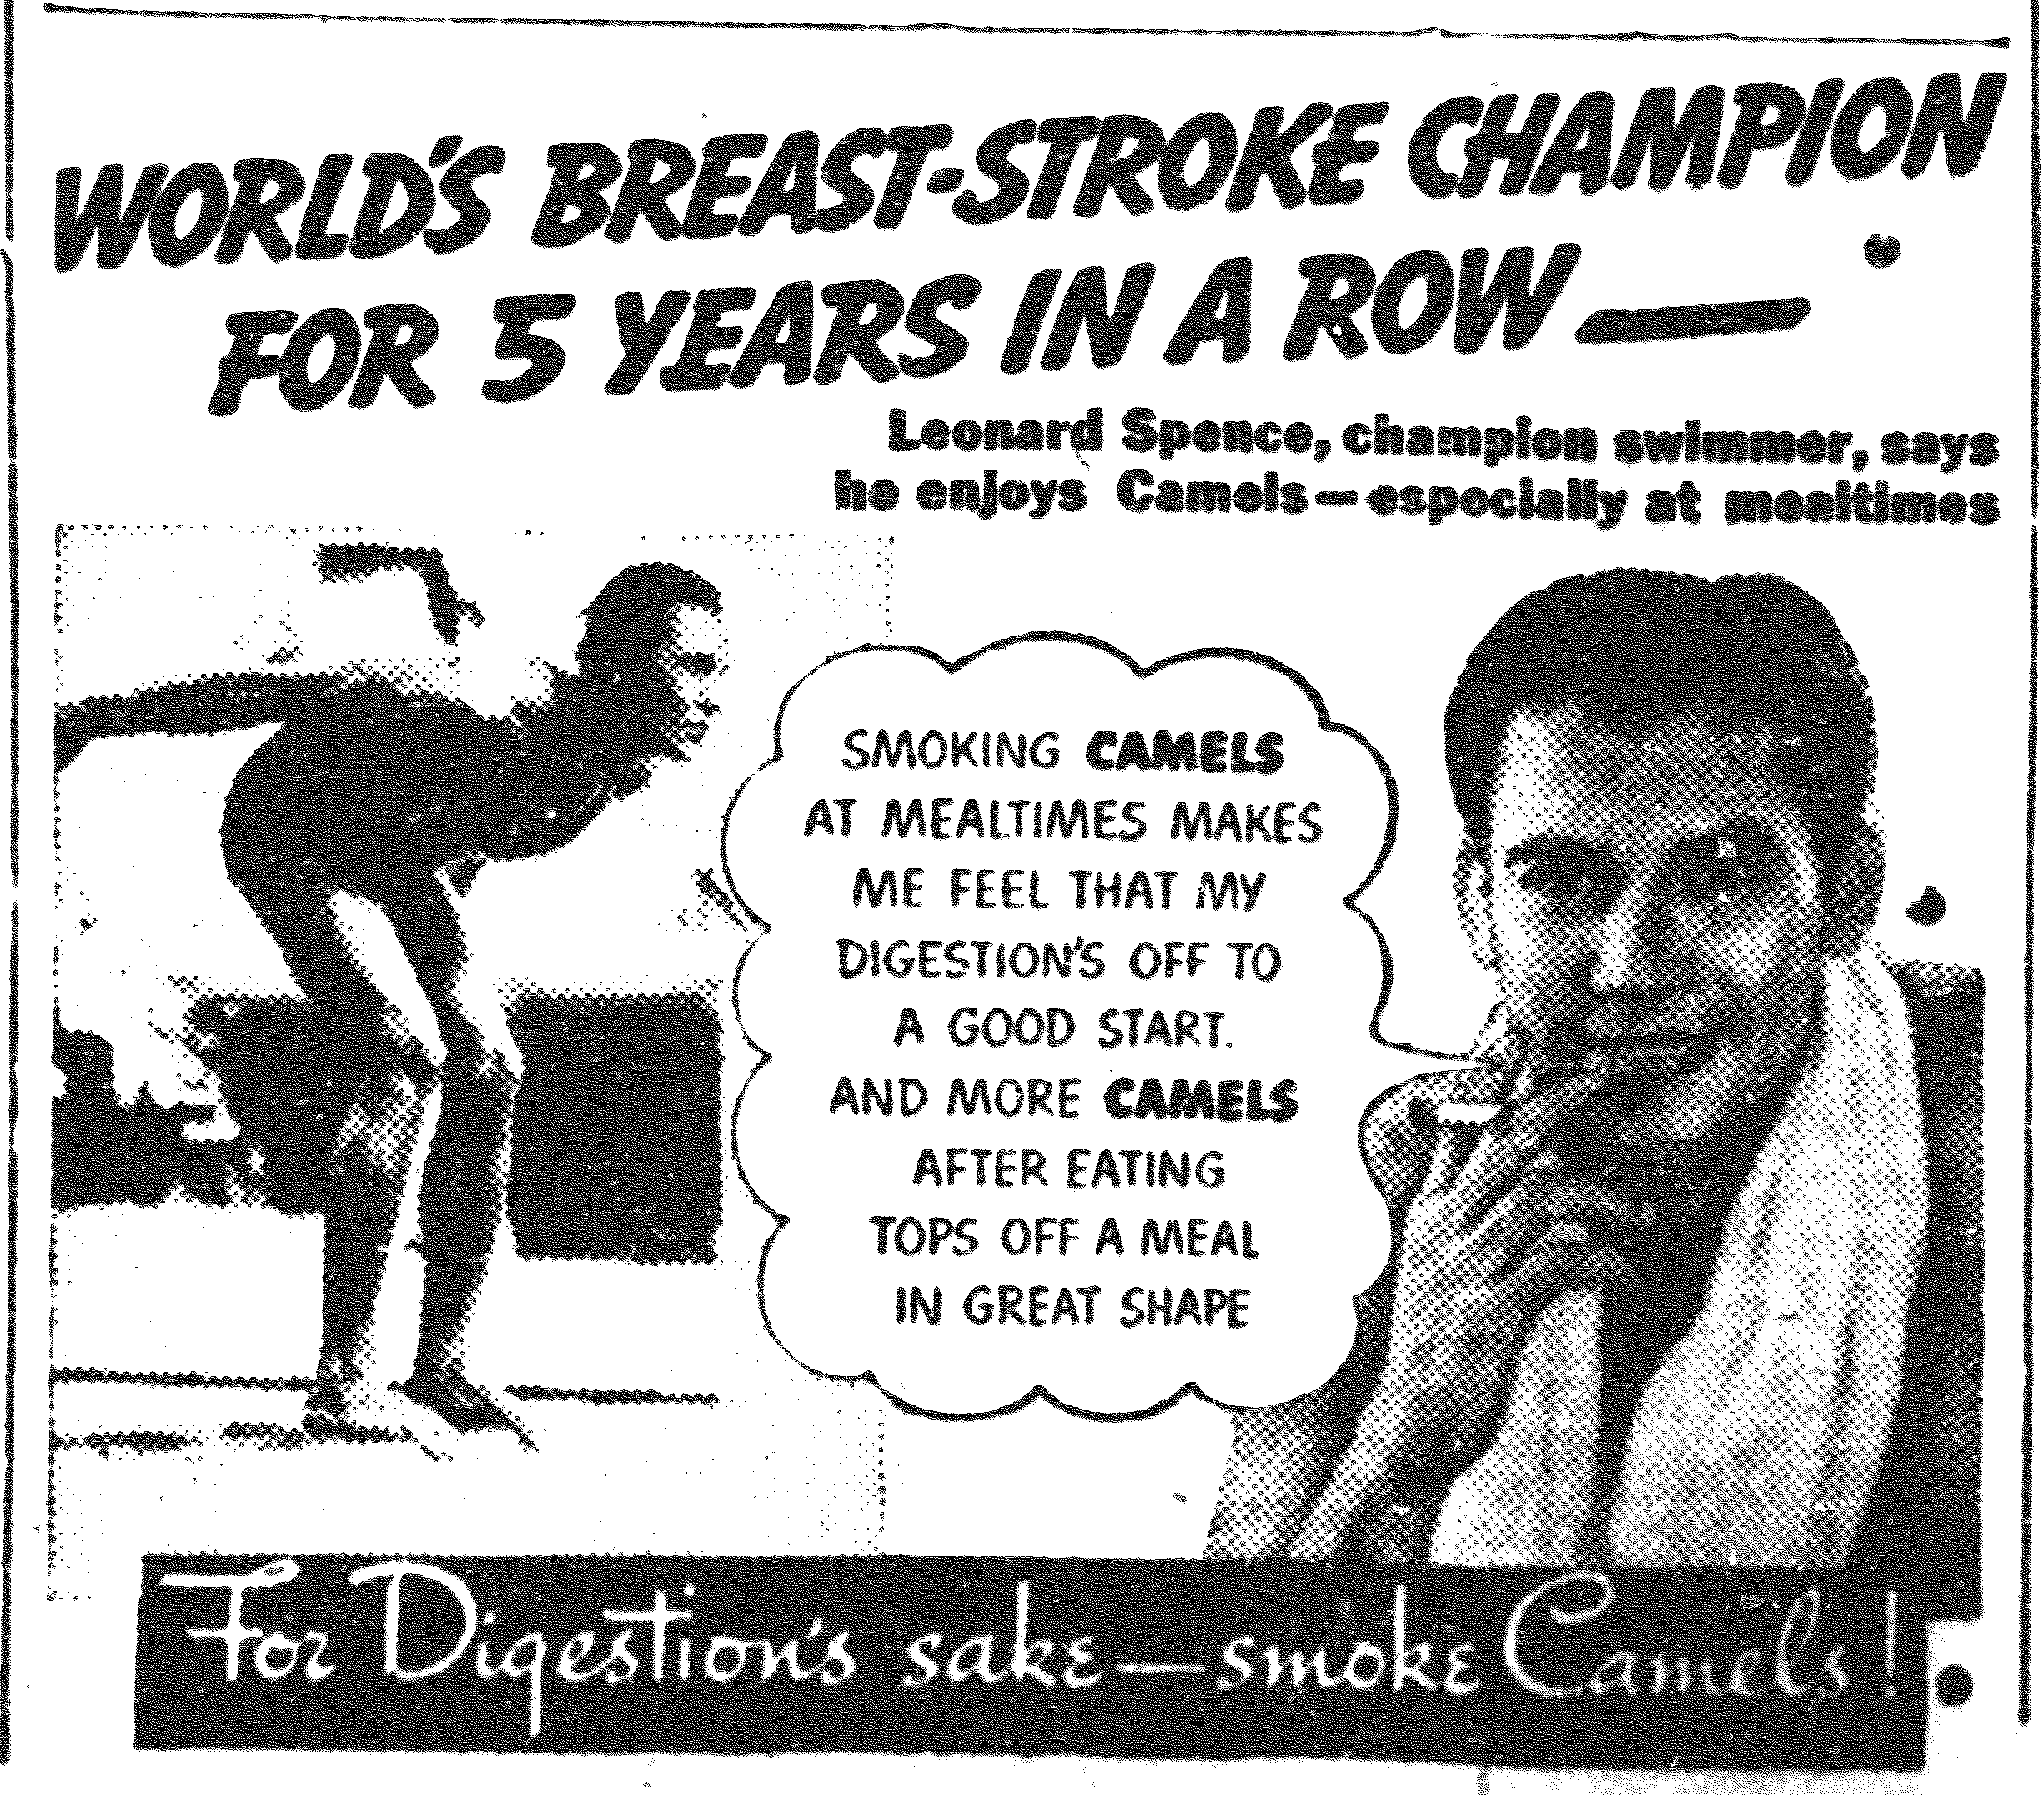 smokecamels.png